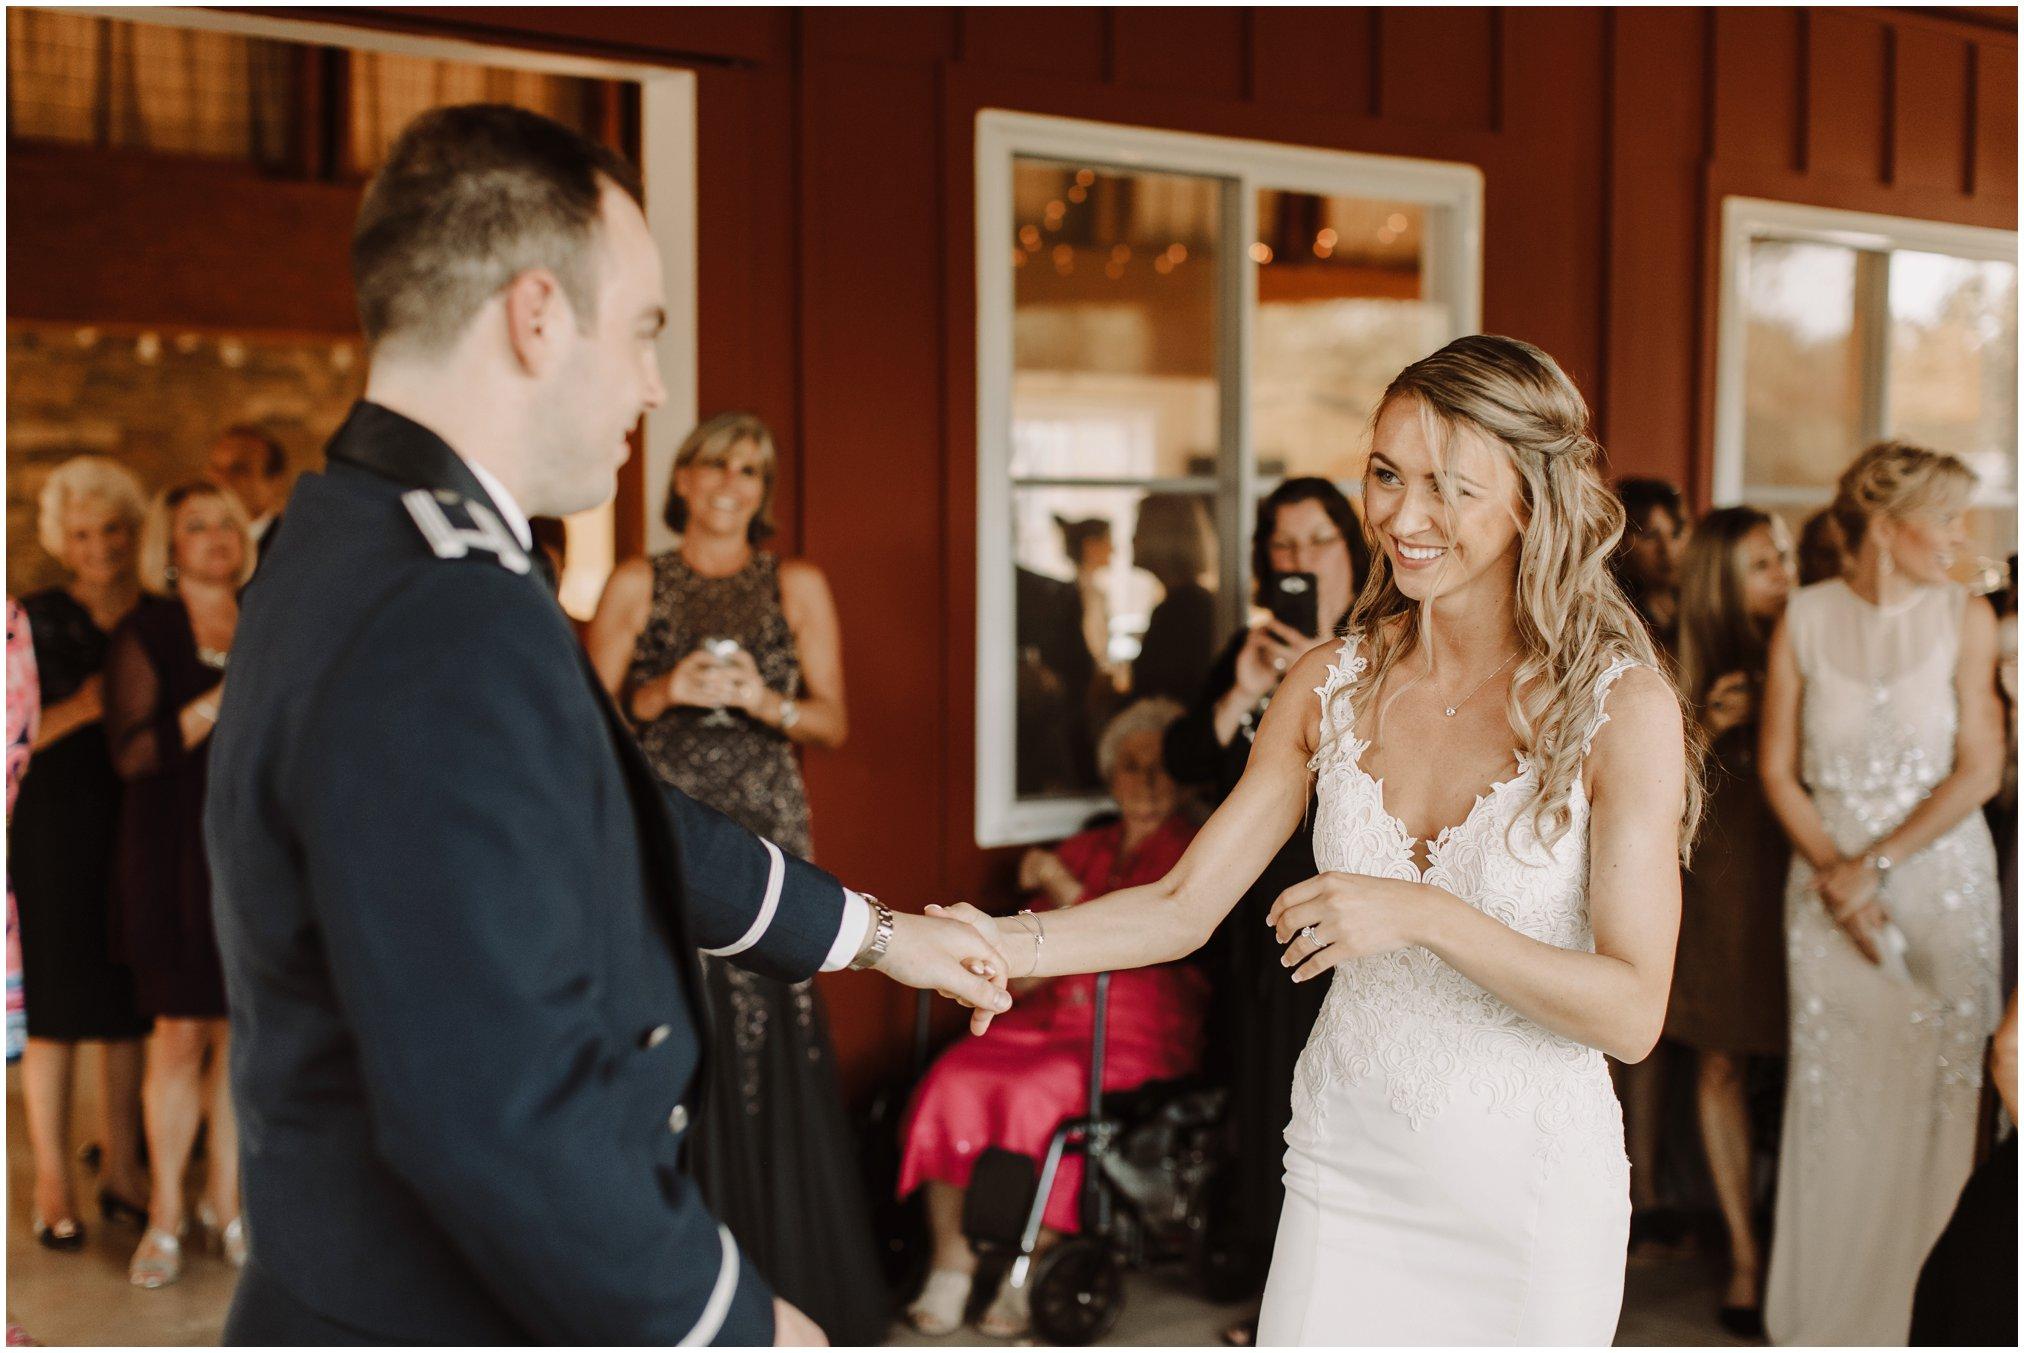 Annapolis Wedding Photographer, Kate Ann Photography, Timberlake Farm, Timberlake Farm Wedding, Annapolis Bride, Earthy Farm Wedding, Boho Farm Wedding, Barn Wedding